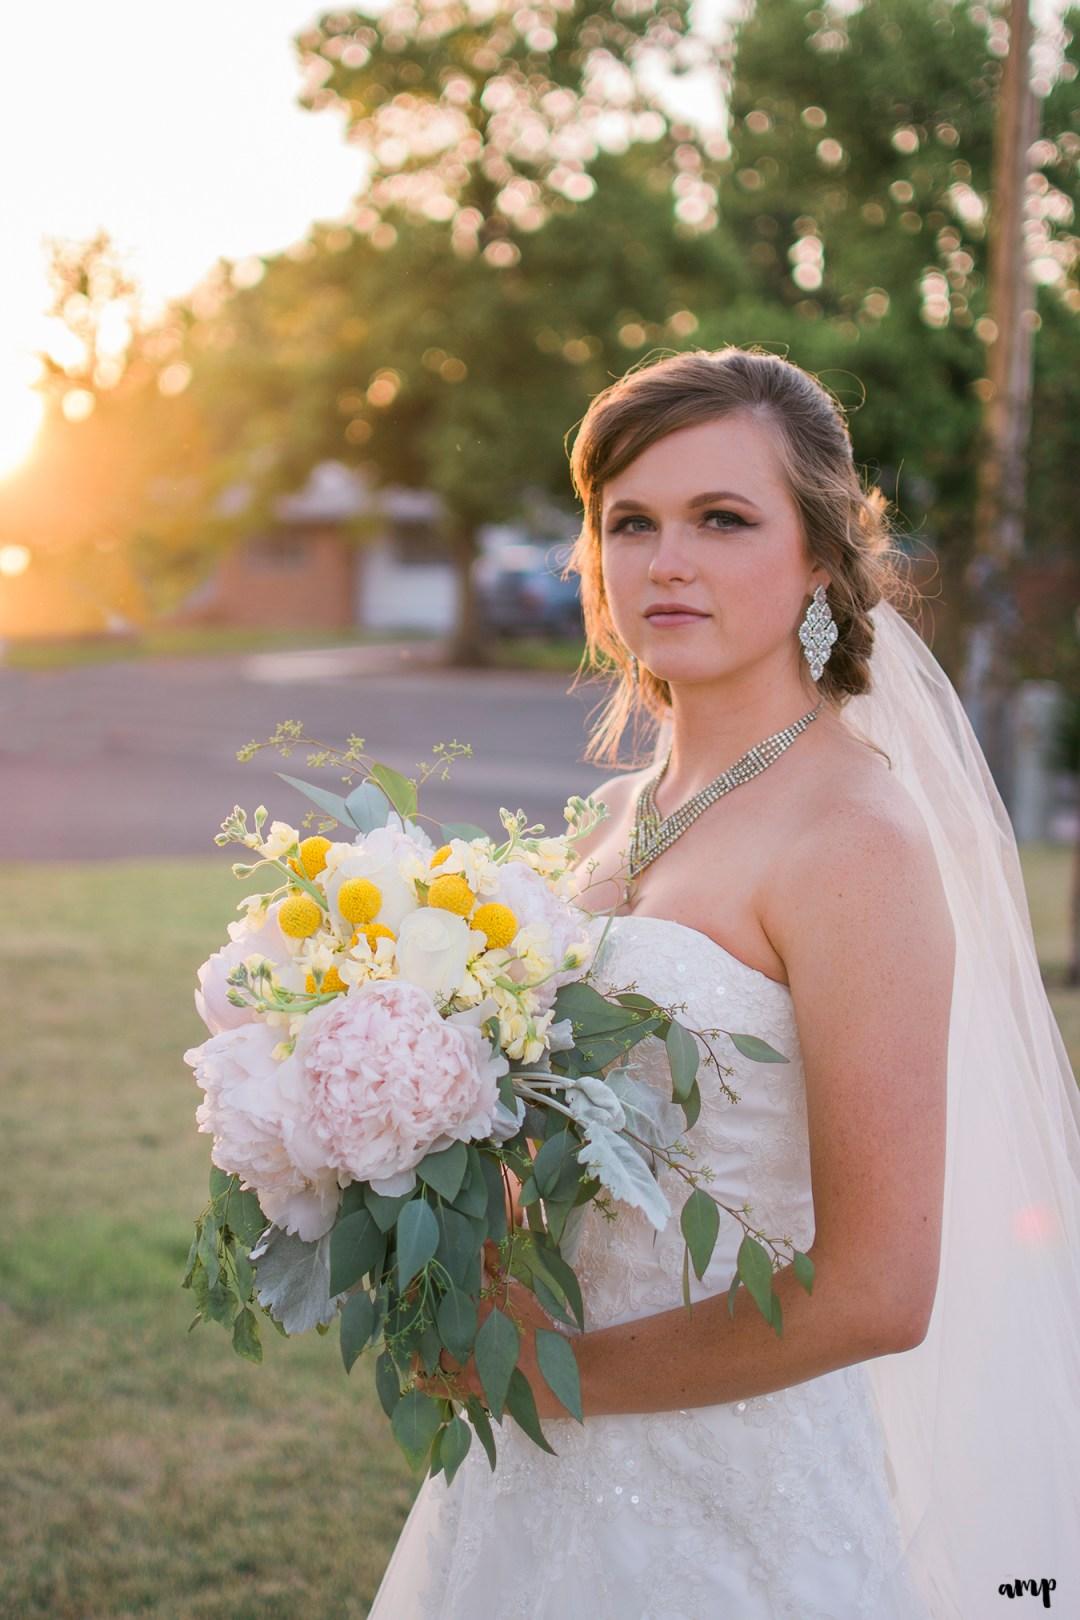 Bridal portraits by amanda.matilda.photography